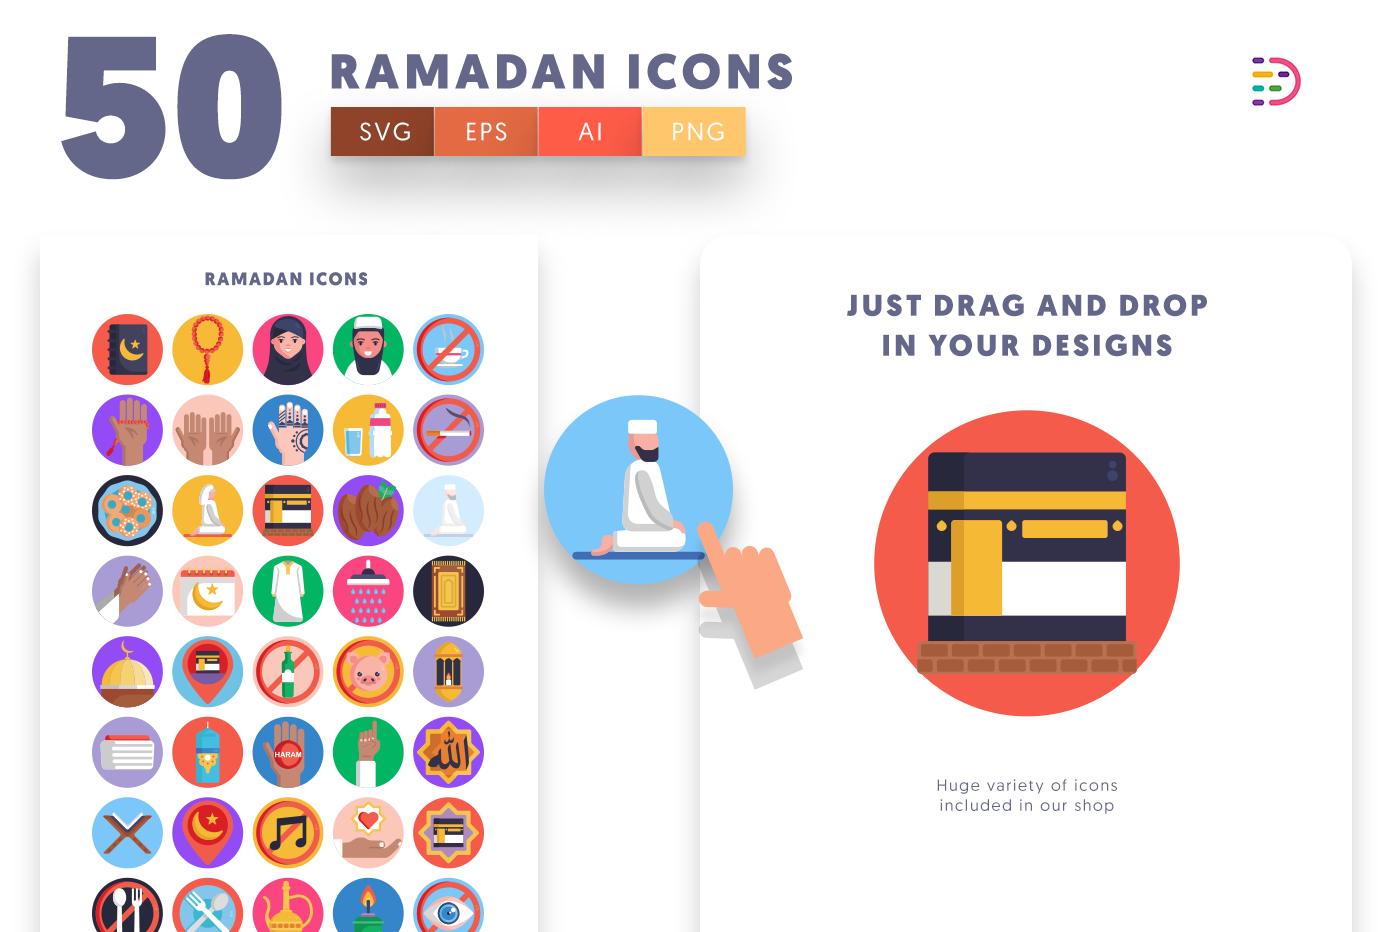 Drag and drop vector 50 Ramadan Icons